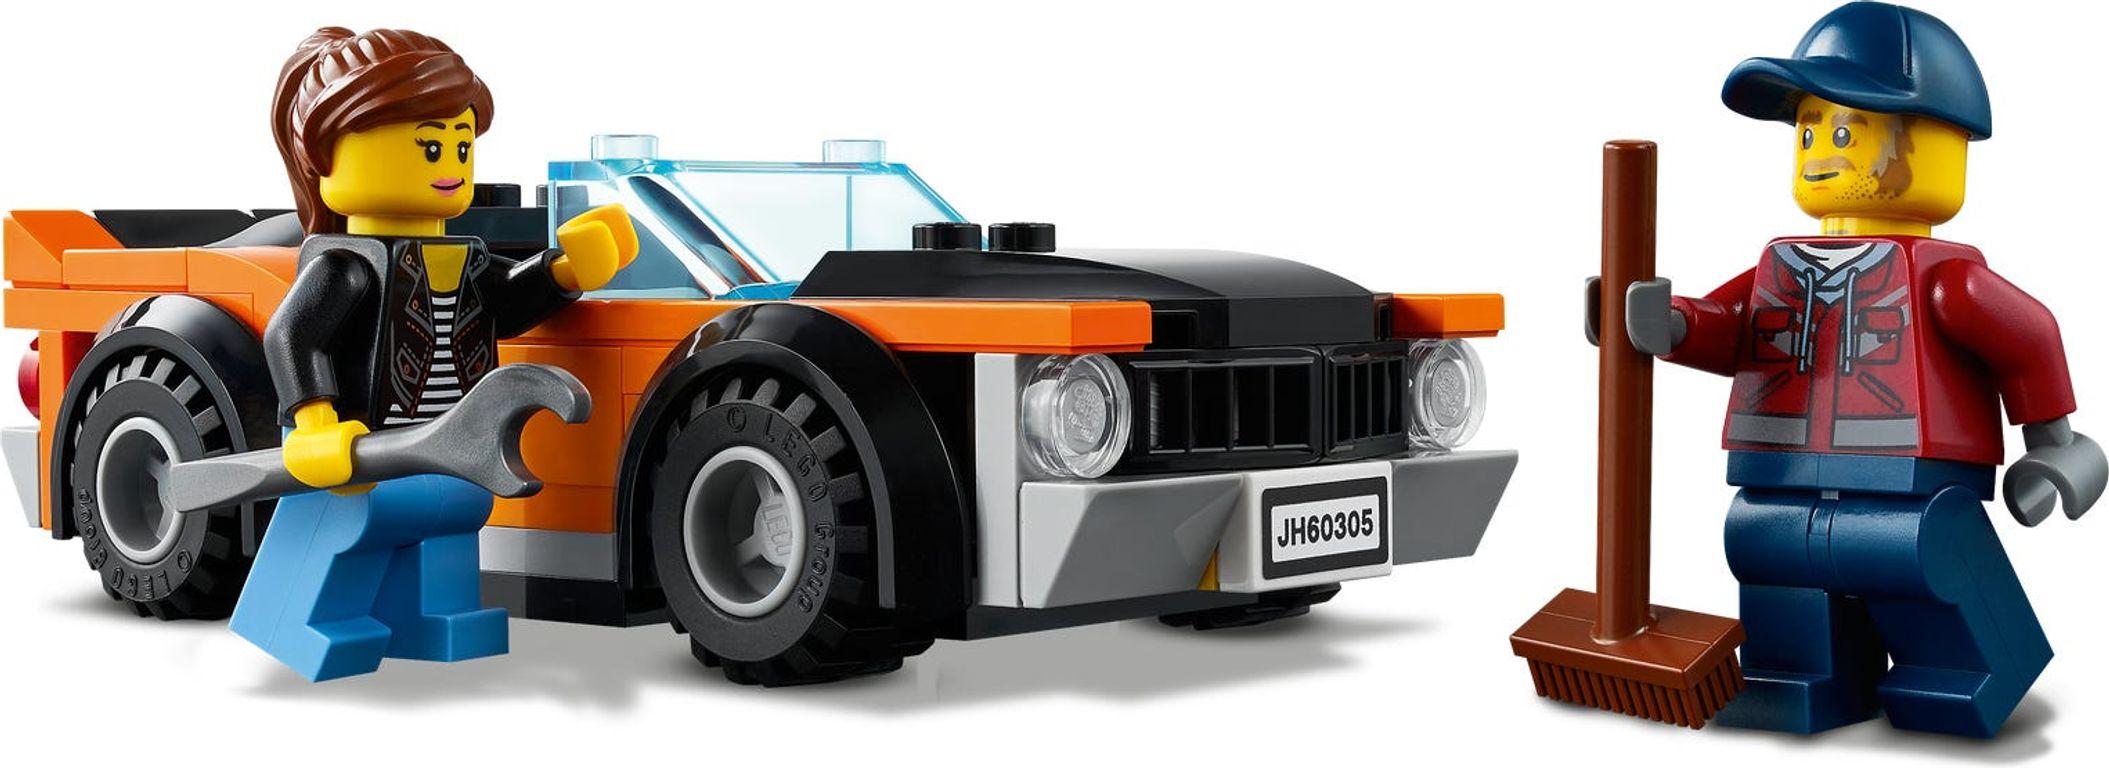 Car Transporter minifigures